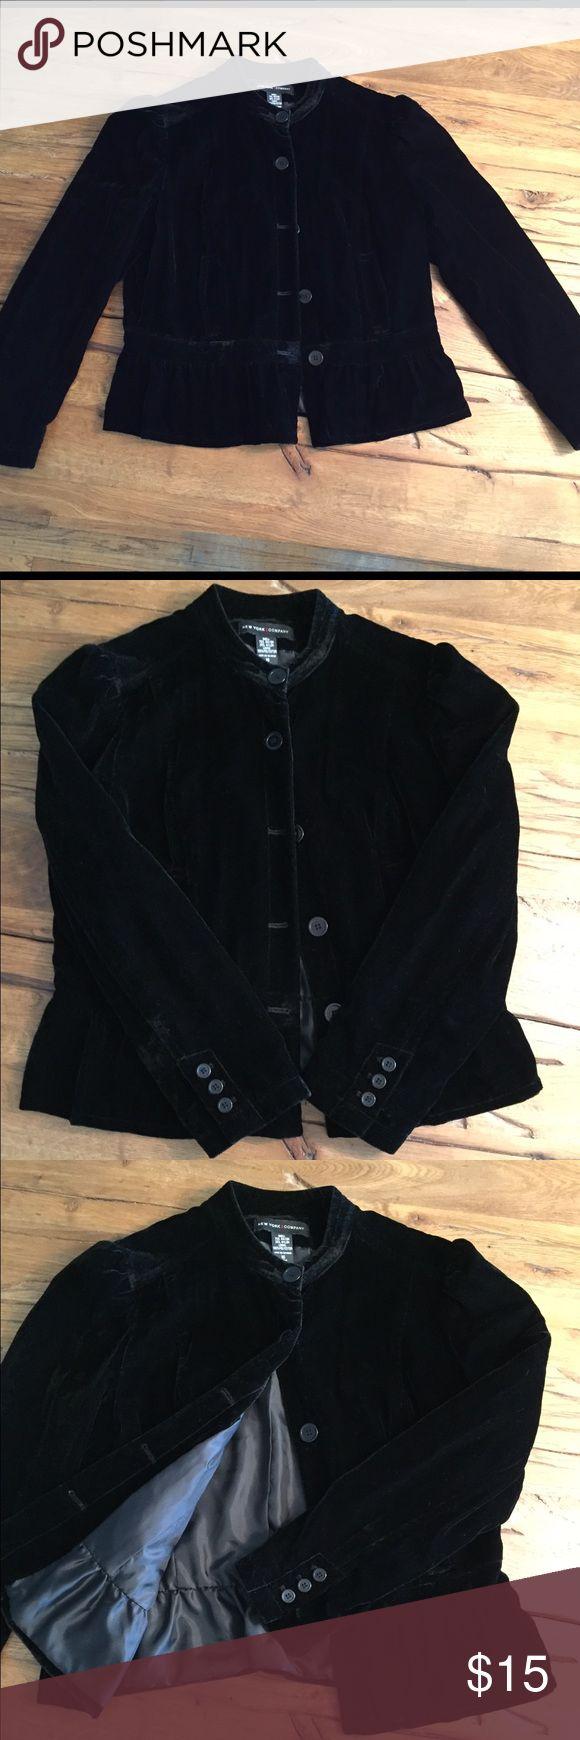 New York & Co velvet jacket Black velvet jacket. Lined. New York & Company Jackets & Coats Blazers